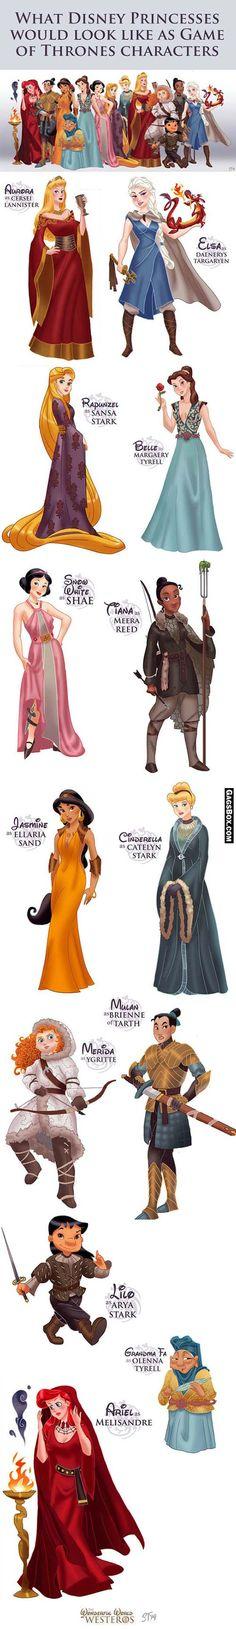 Disney's G O T